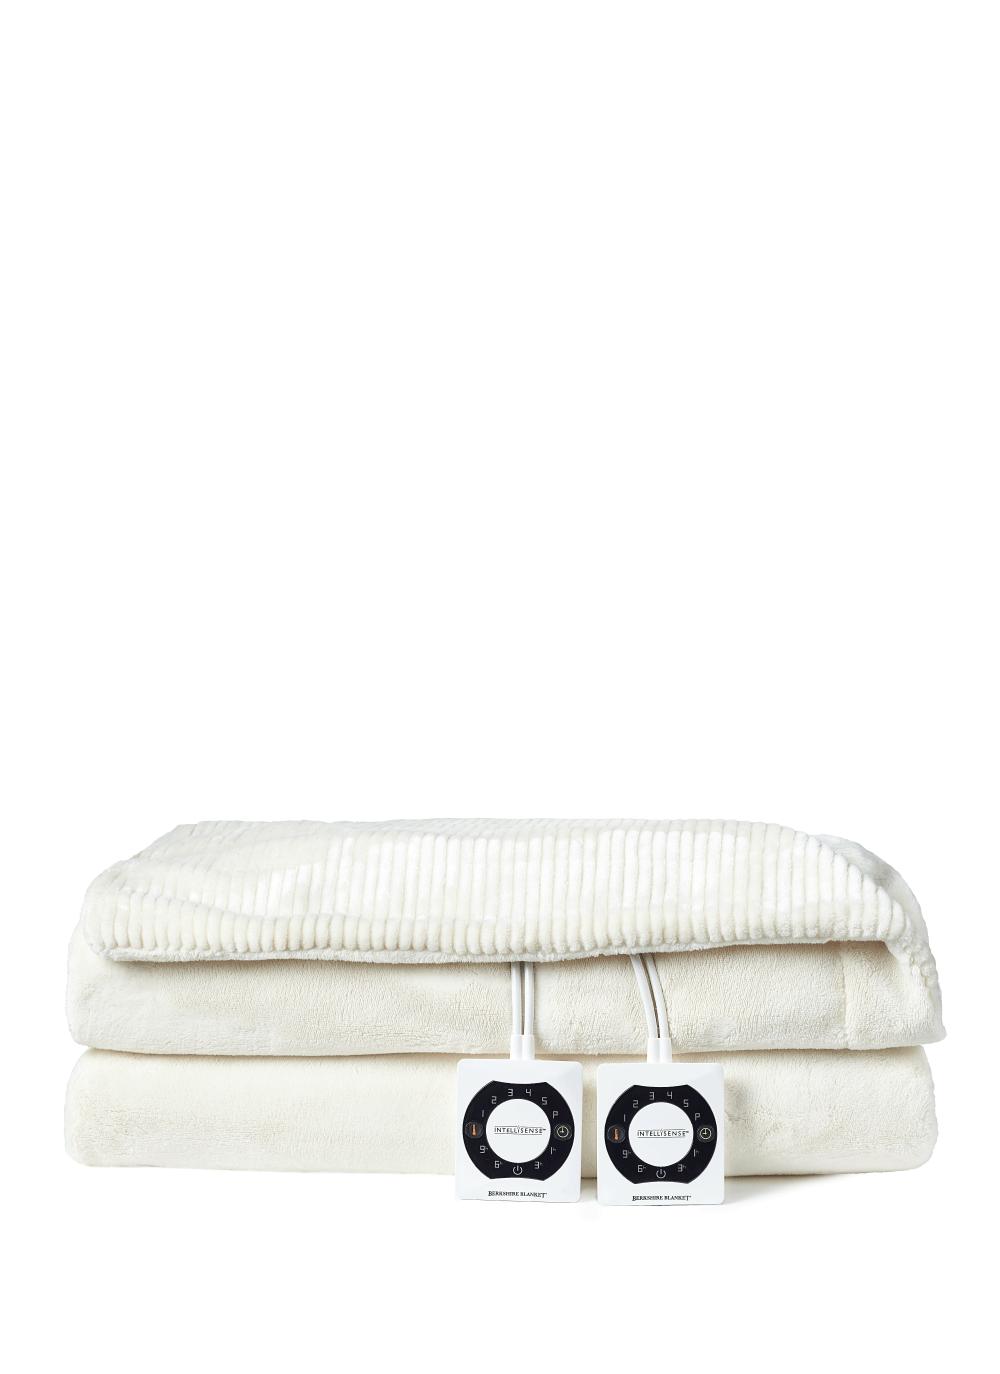 L Bean Heated Blanket